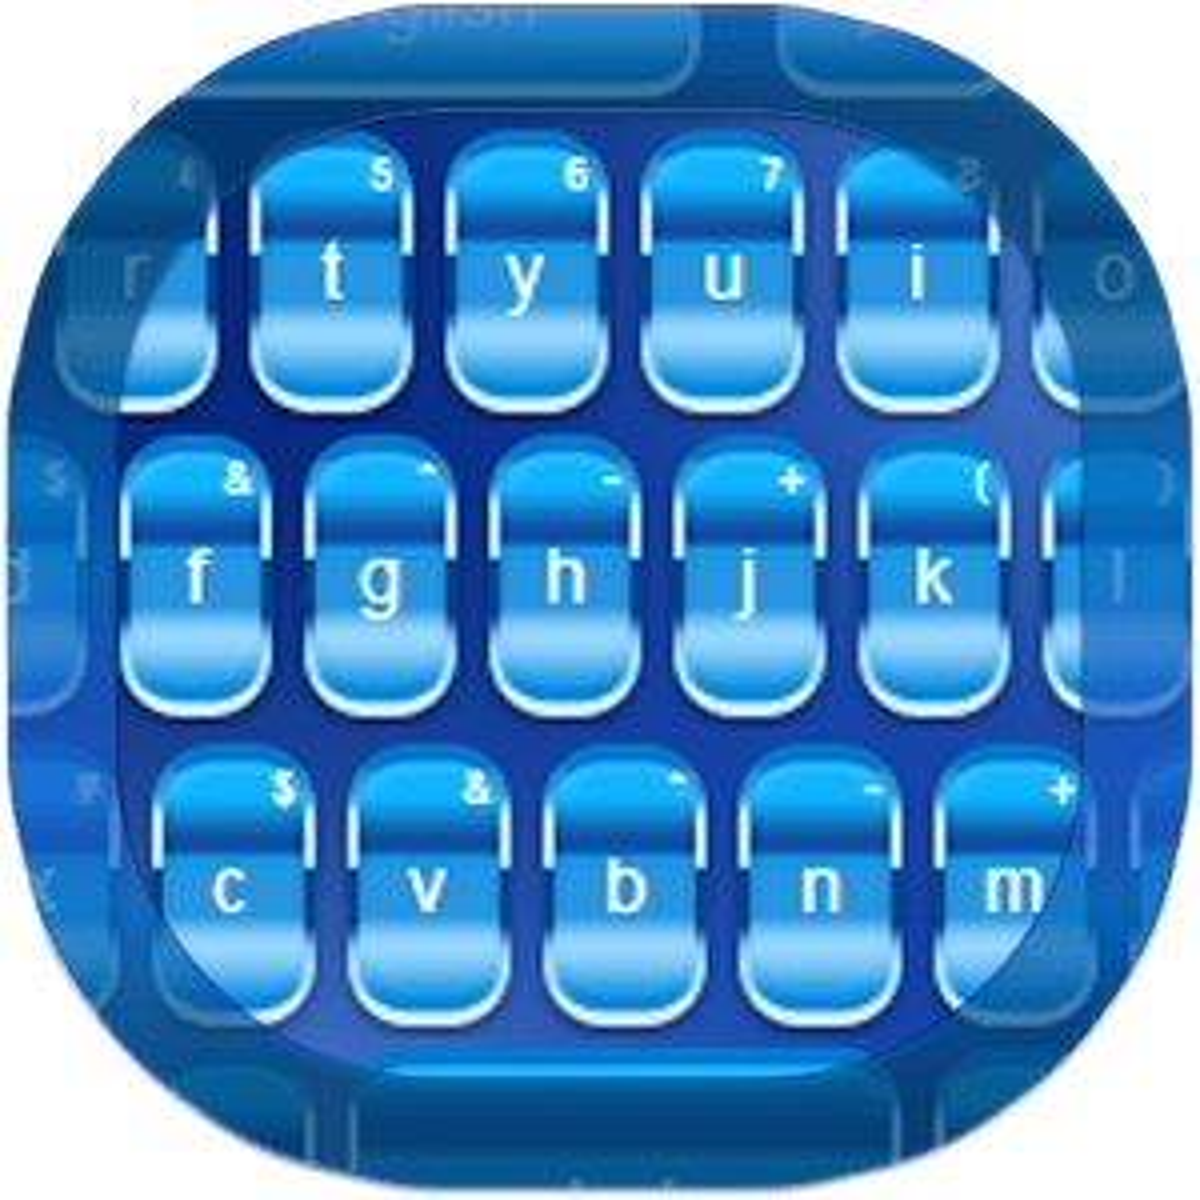 Teclado azul para Android 1.73.16.26